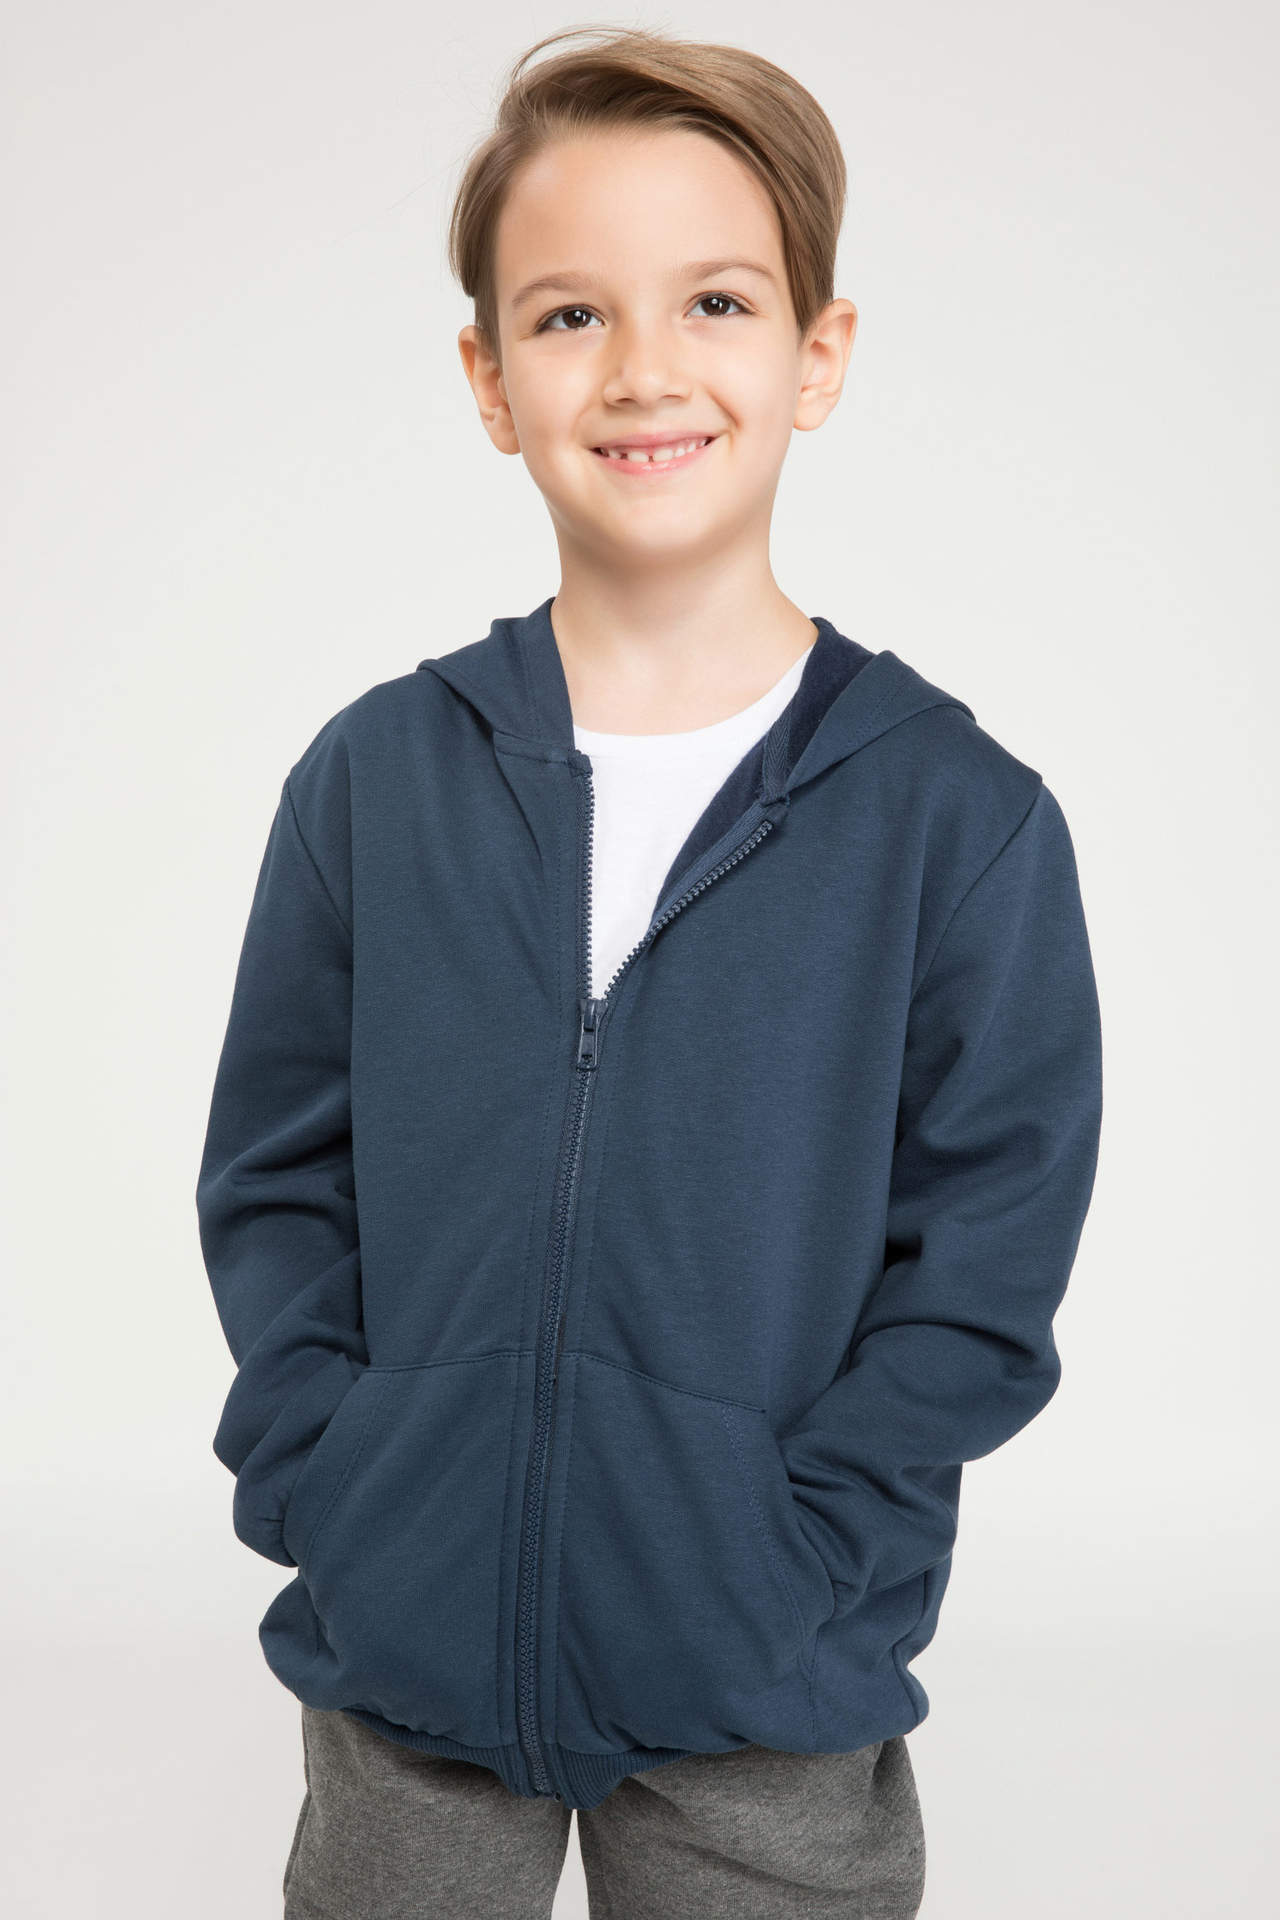 DeFacto Erkek Çocuk Kapüşonlu Sweatshirt Mavi male